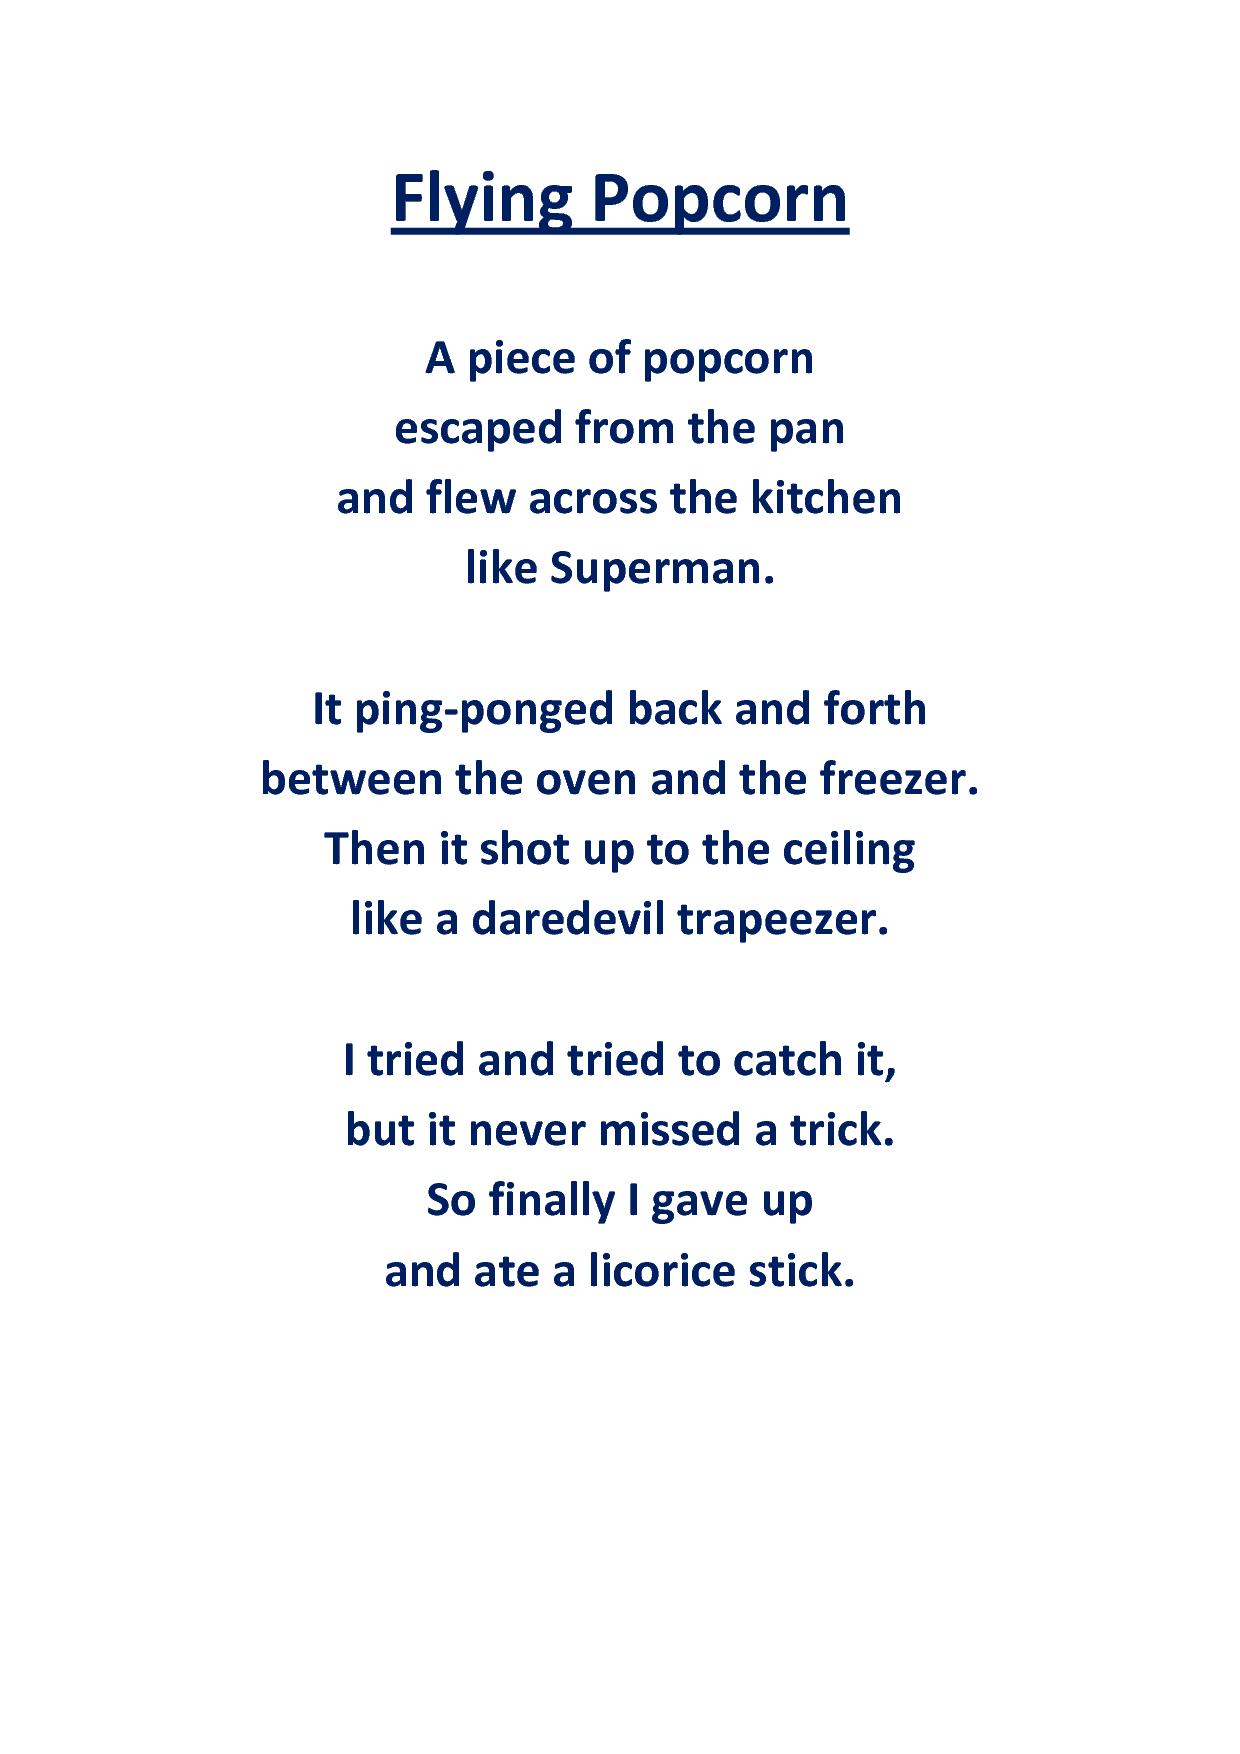 The Popcorn Poem